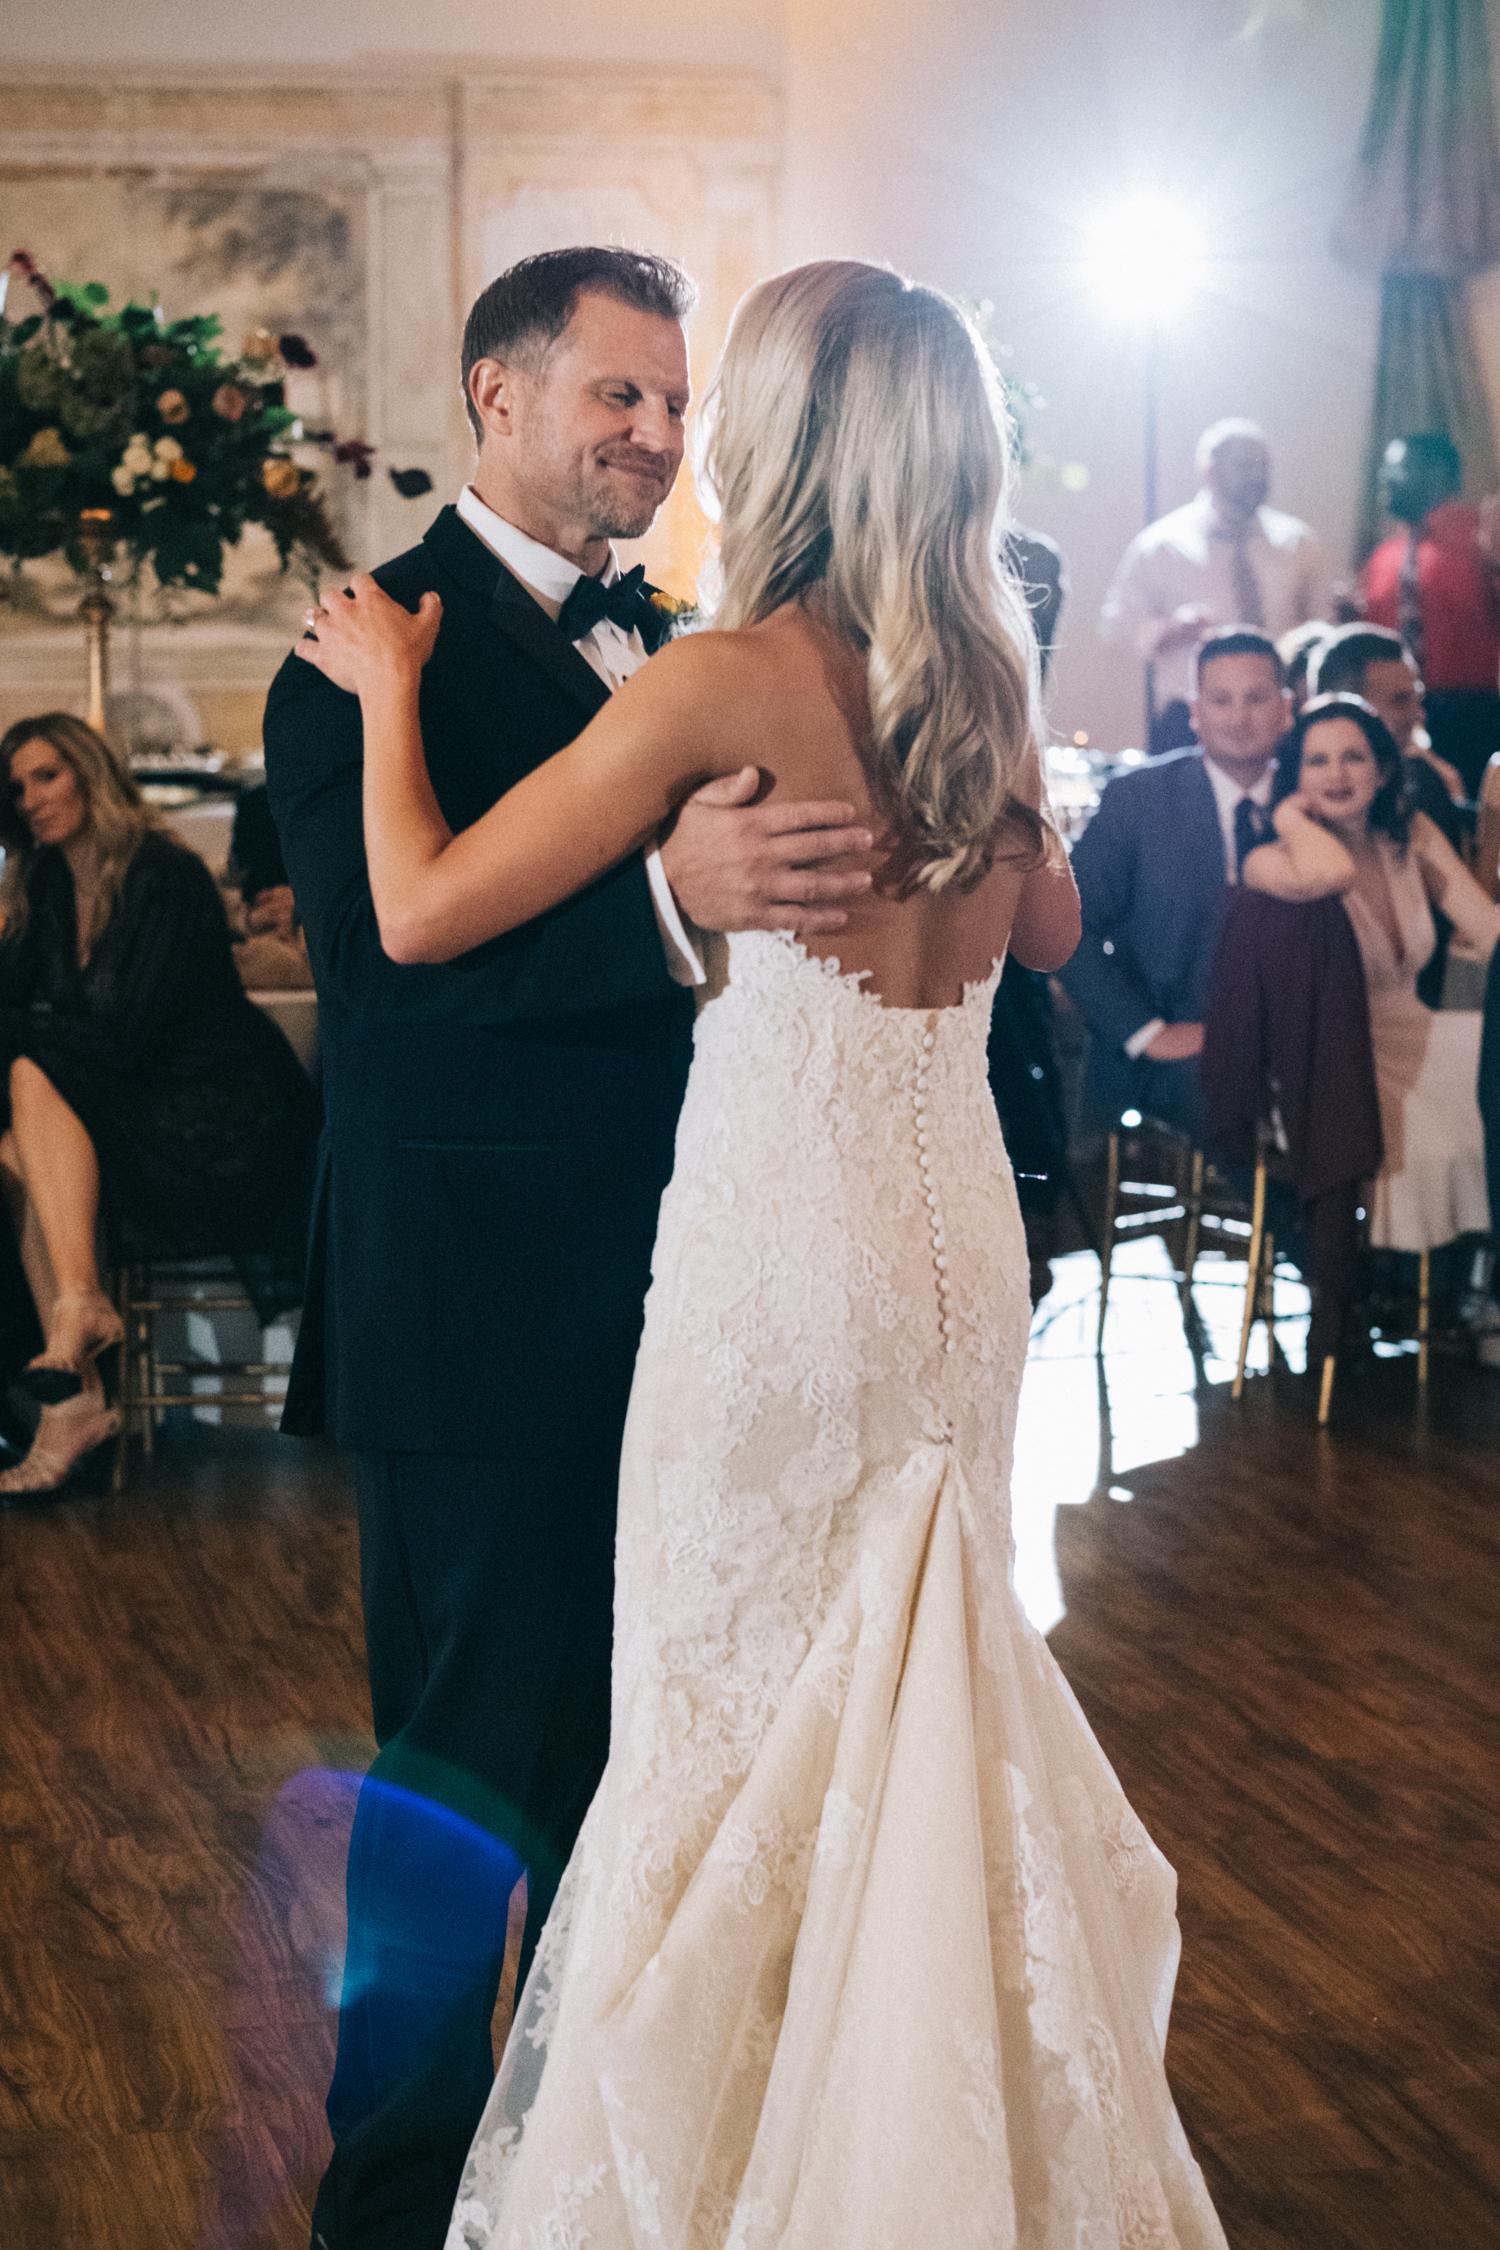 potomac point winery wedding-62.jpg